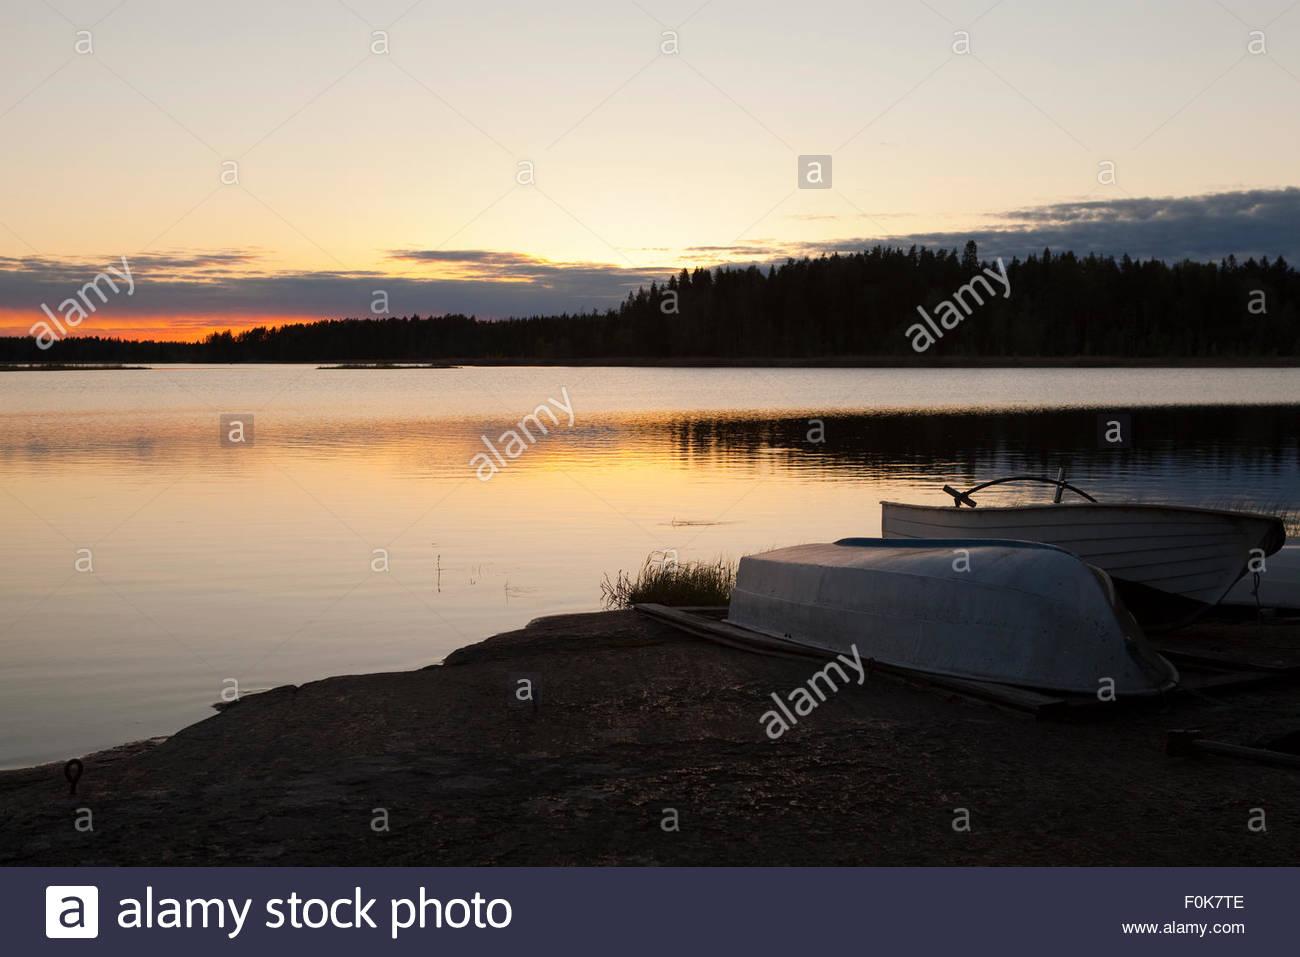 Boats upside down at lake Koskeljärvi - Stock Image